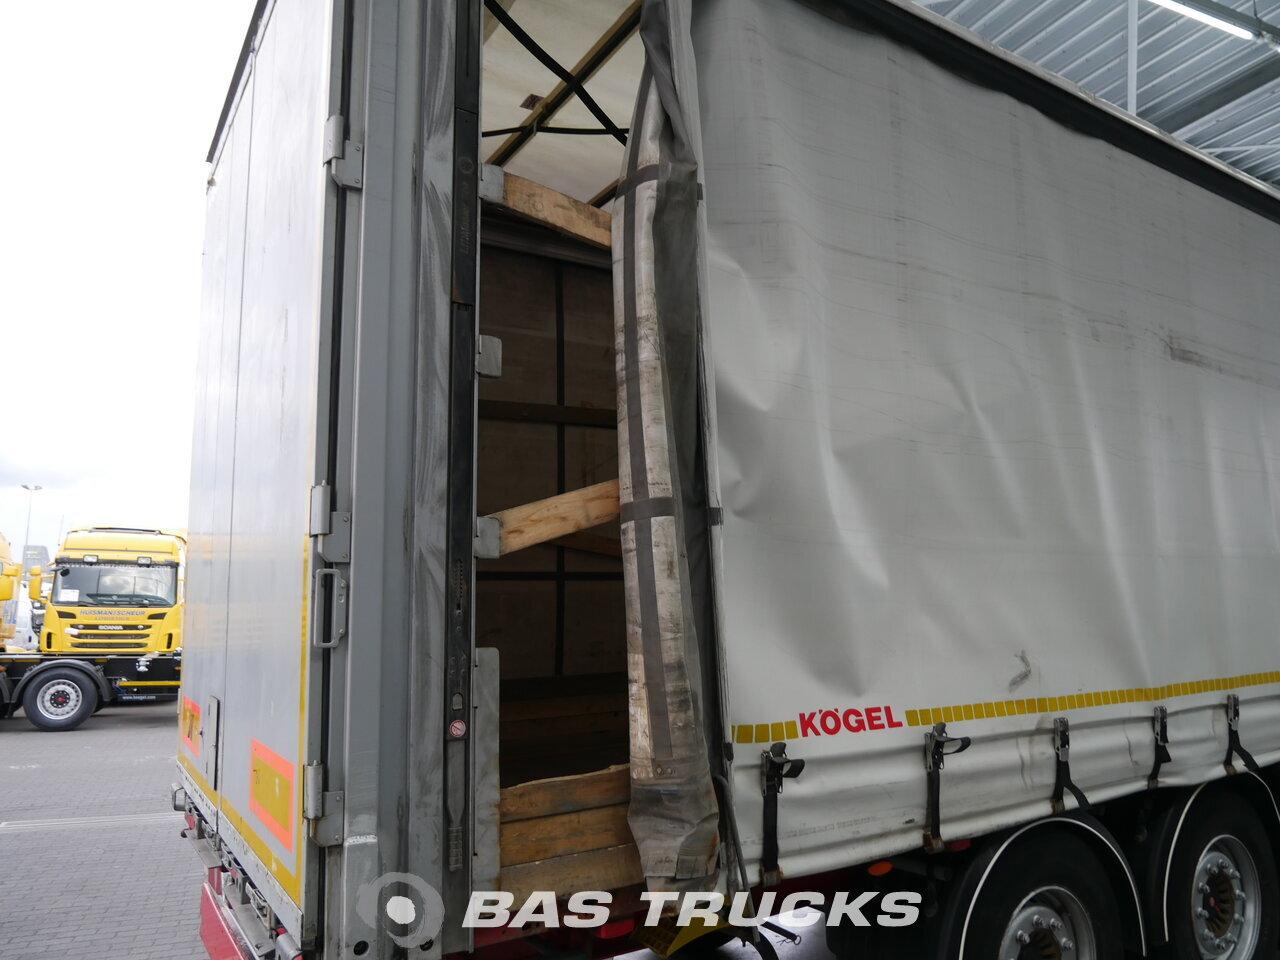 photo of Used Semi-trailer KOGEL Hubdach mit Rungen SN24 Axels 2012